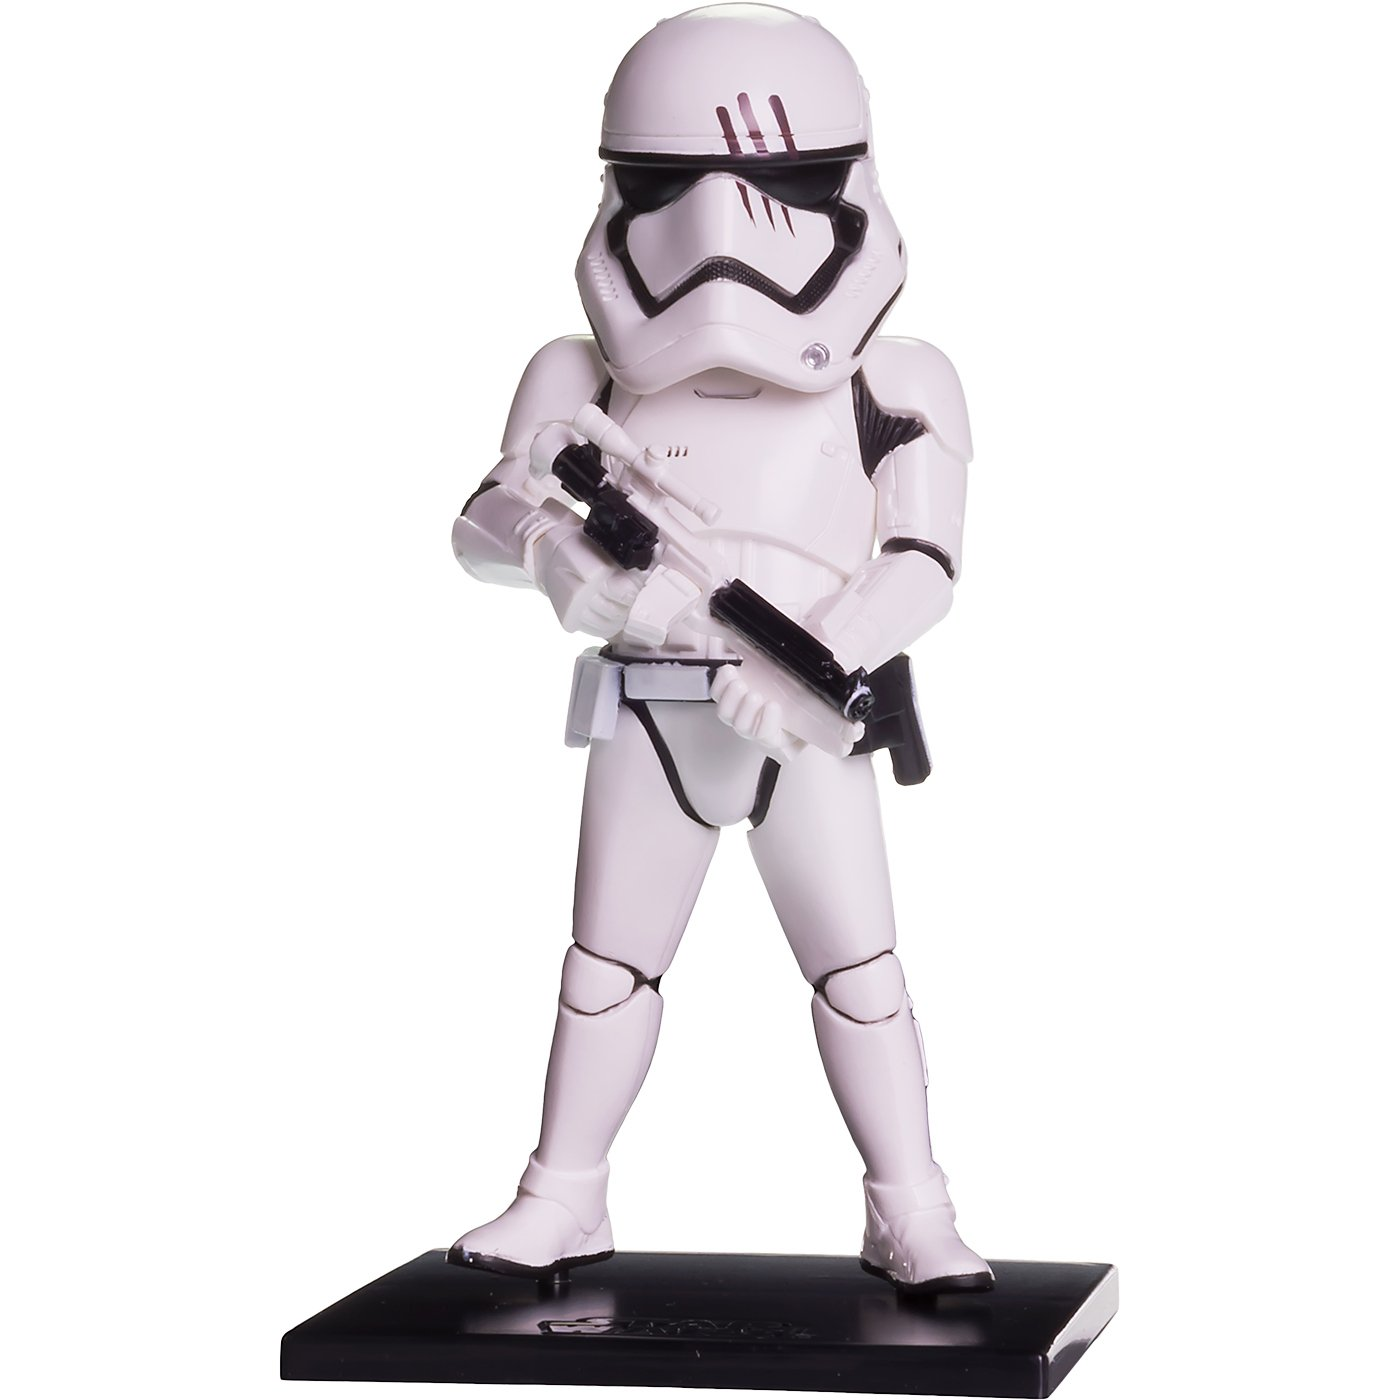 Banpresto First Order Stormtrooper 36707 : ~5.1 Star Wars x WCF Premium Mini Statue Figurine 1 Official Star Wars Trading Card Bundle BCC94R6D Battle Scene Ver.